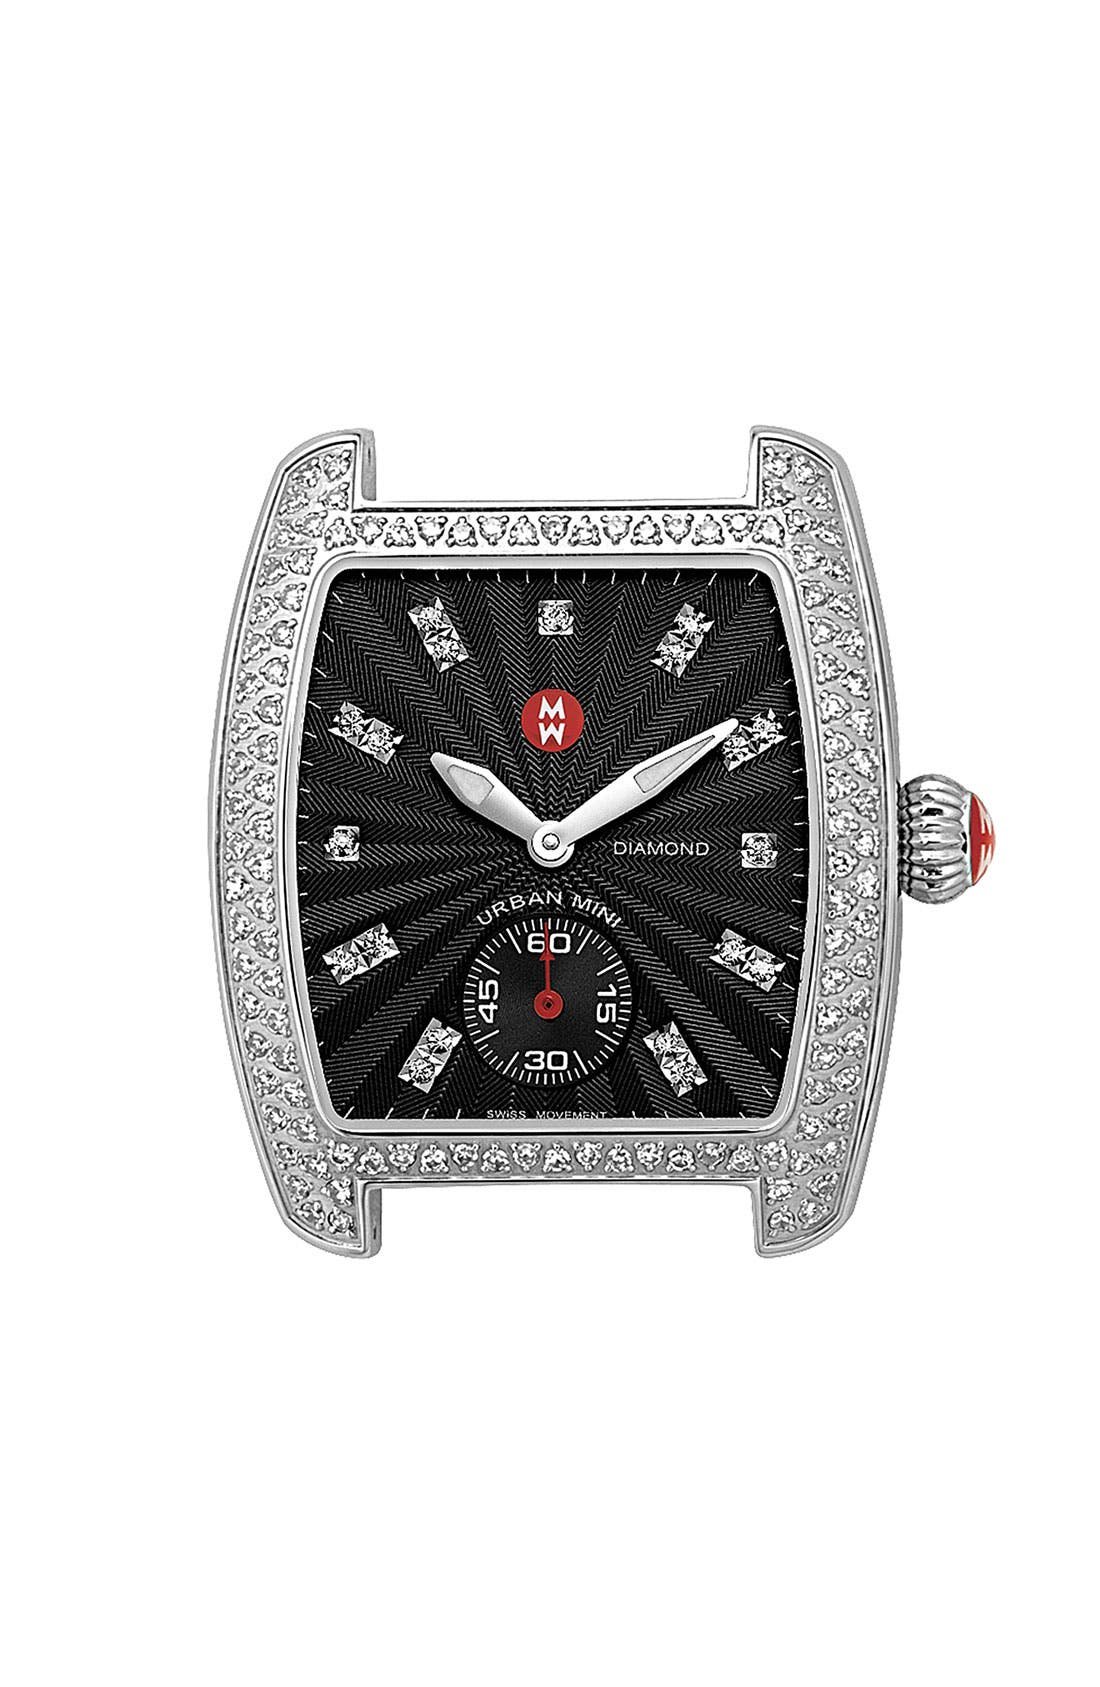 Main Image - MICHELE 'Urban Mini Diamond' Black Dial Watch Case